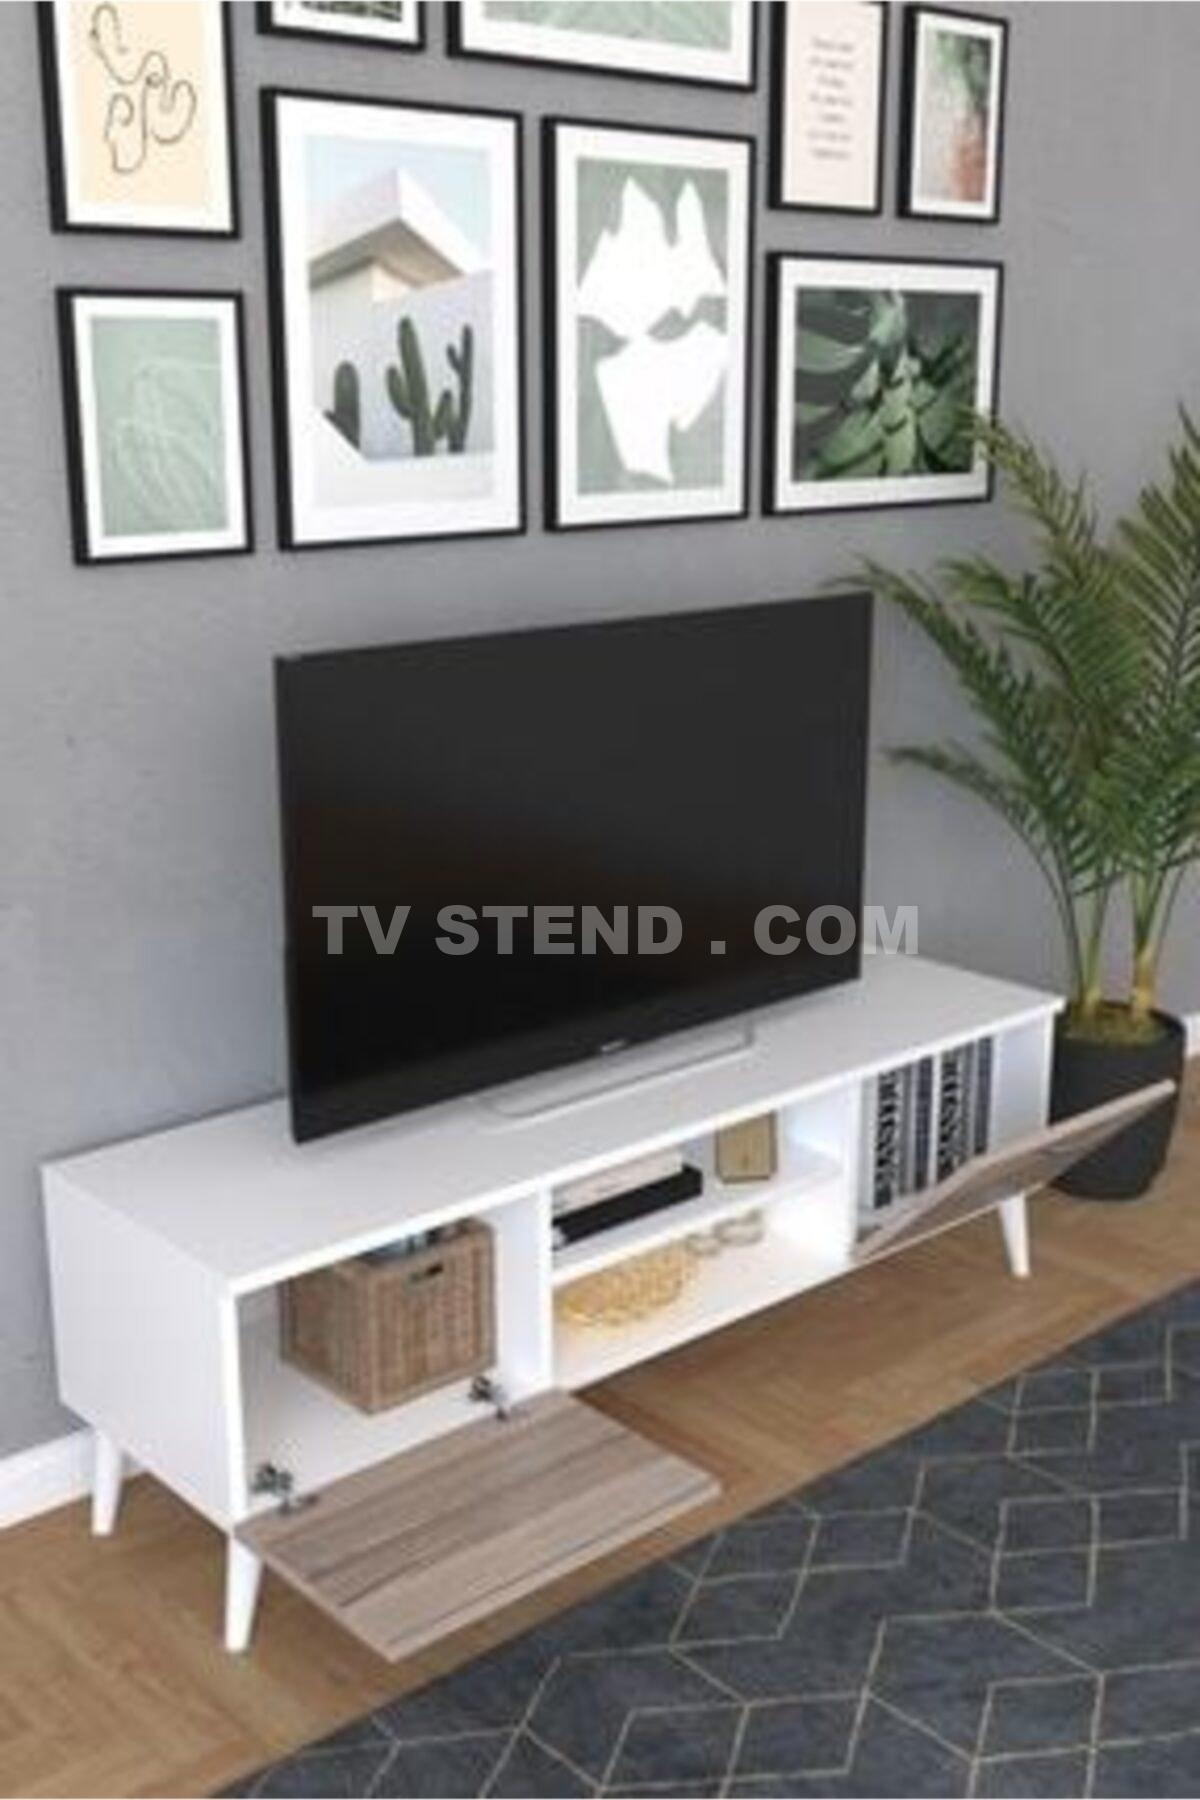 Cordoba tv stend